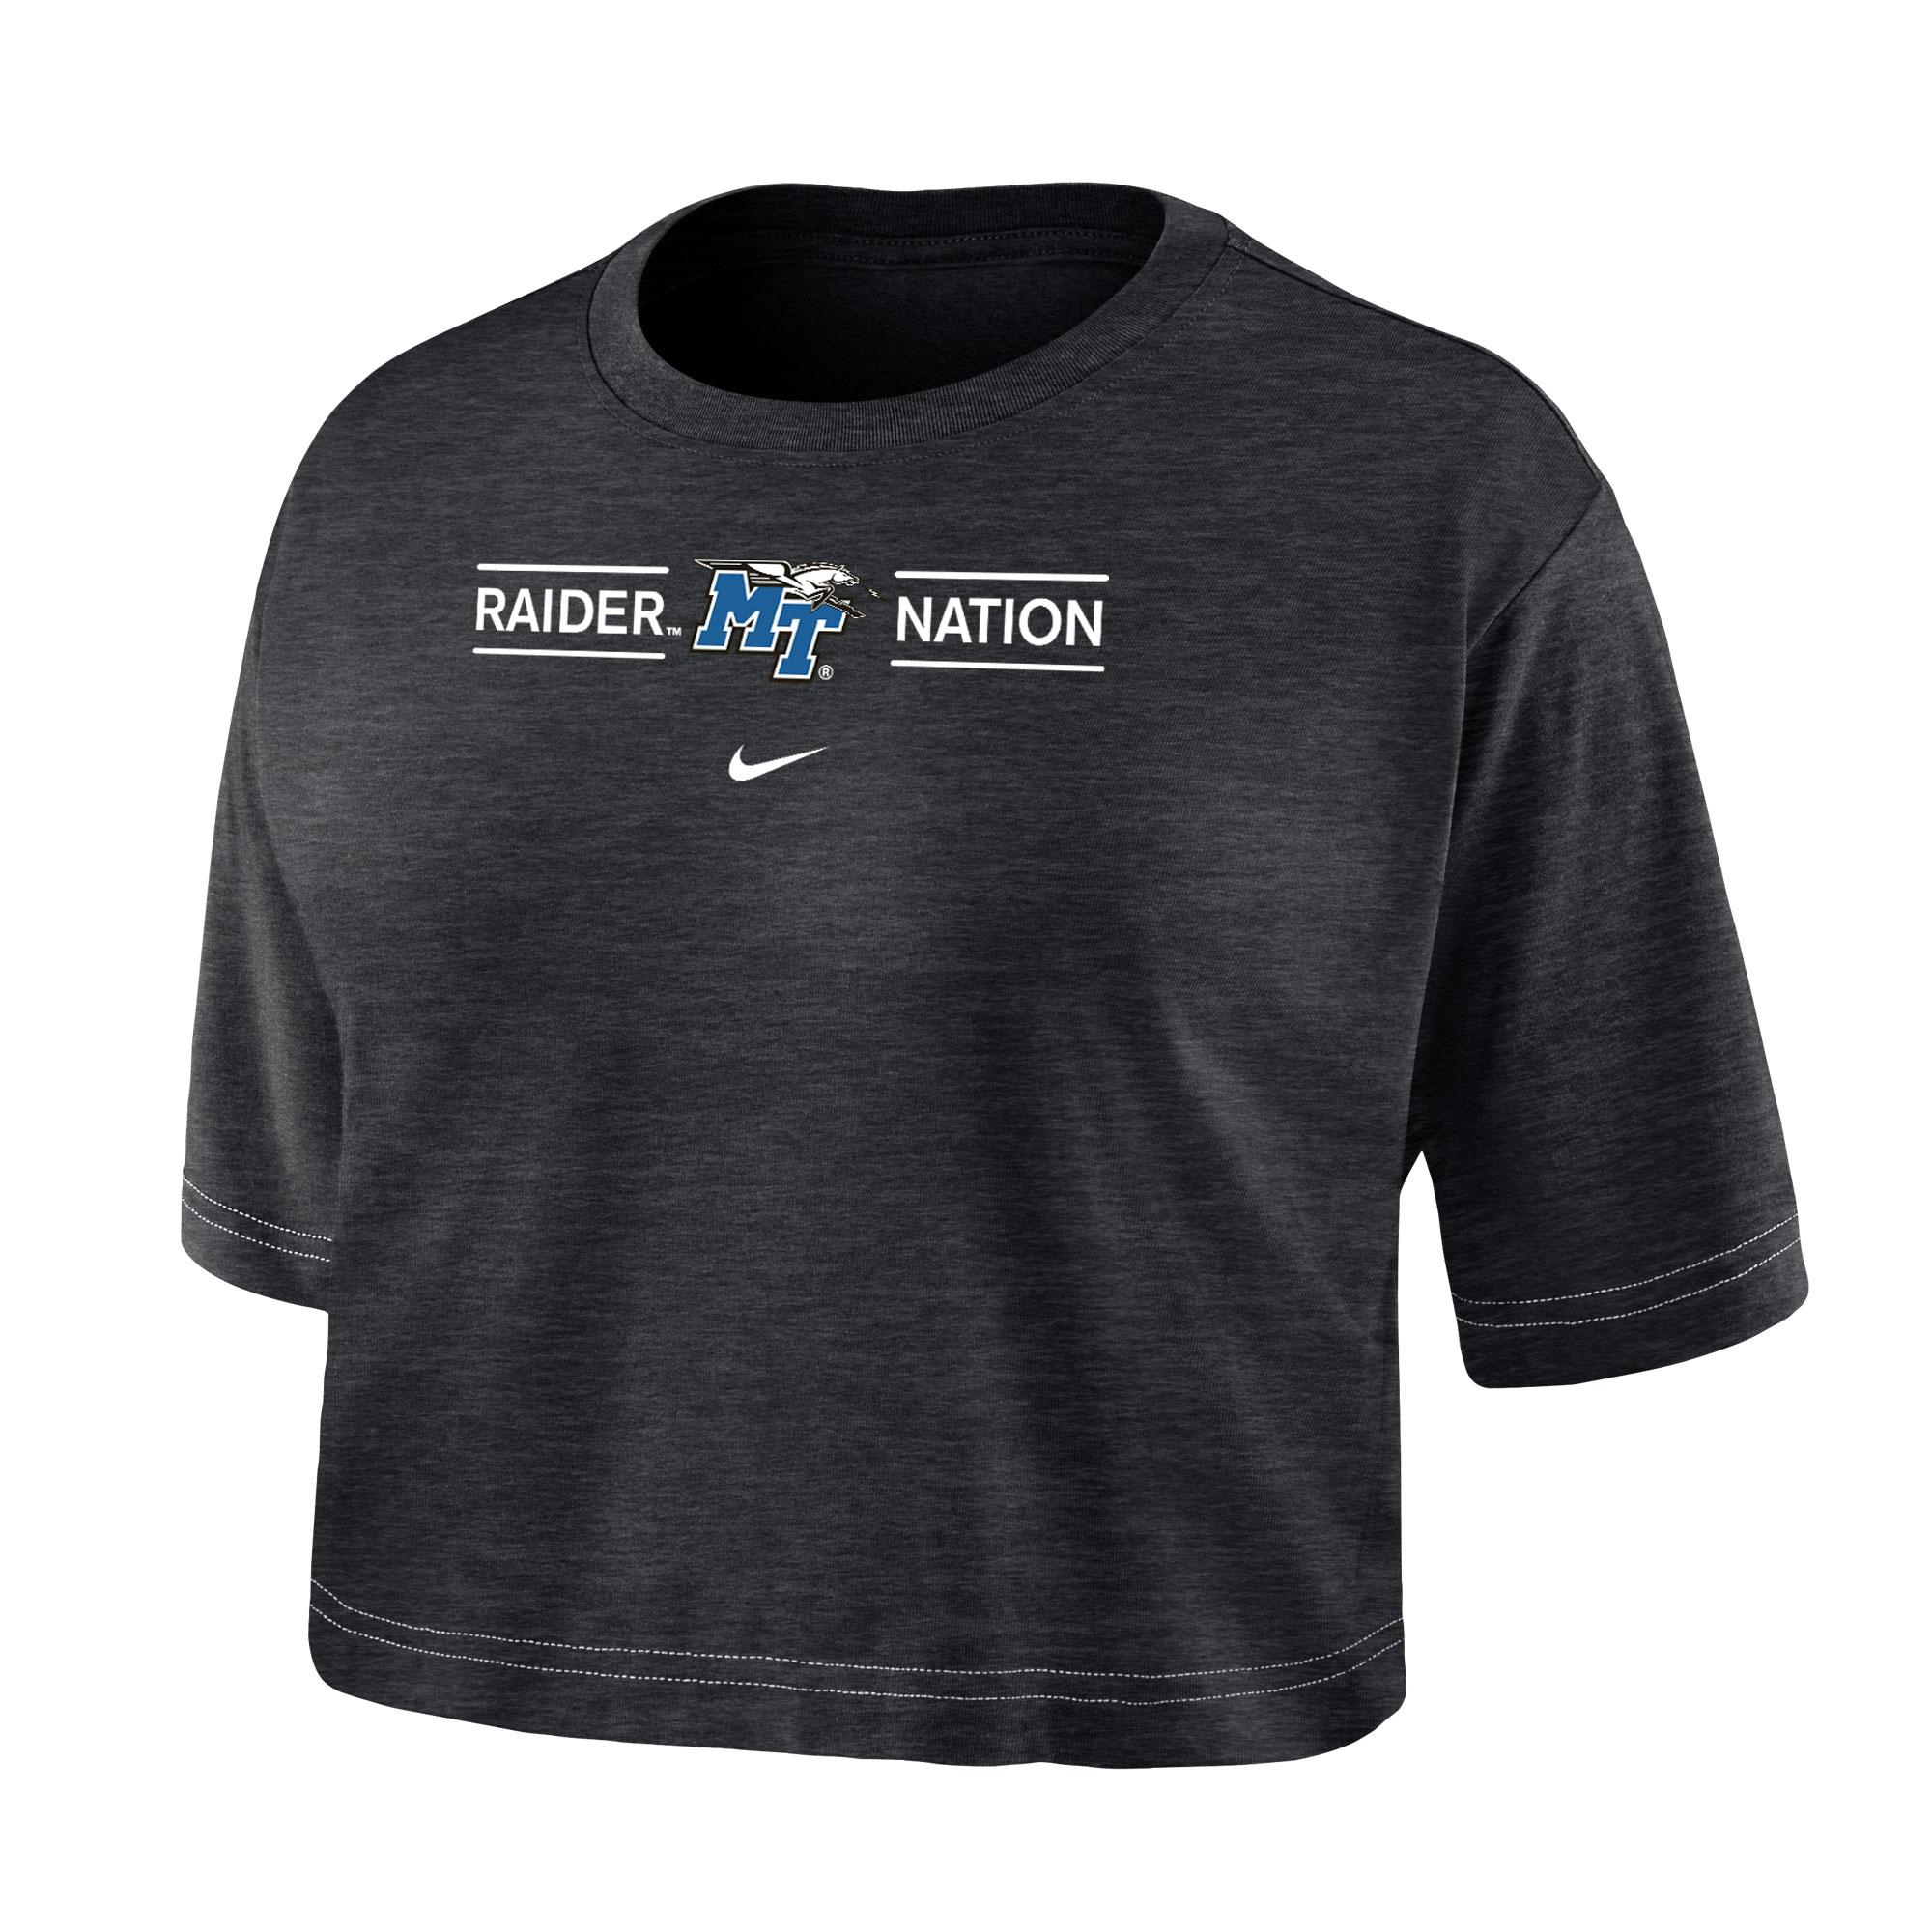 Raider Nation Women's Nike® Dri-Fit Cotton Slub Crop Top